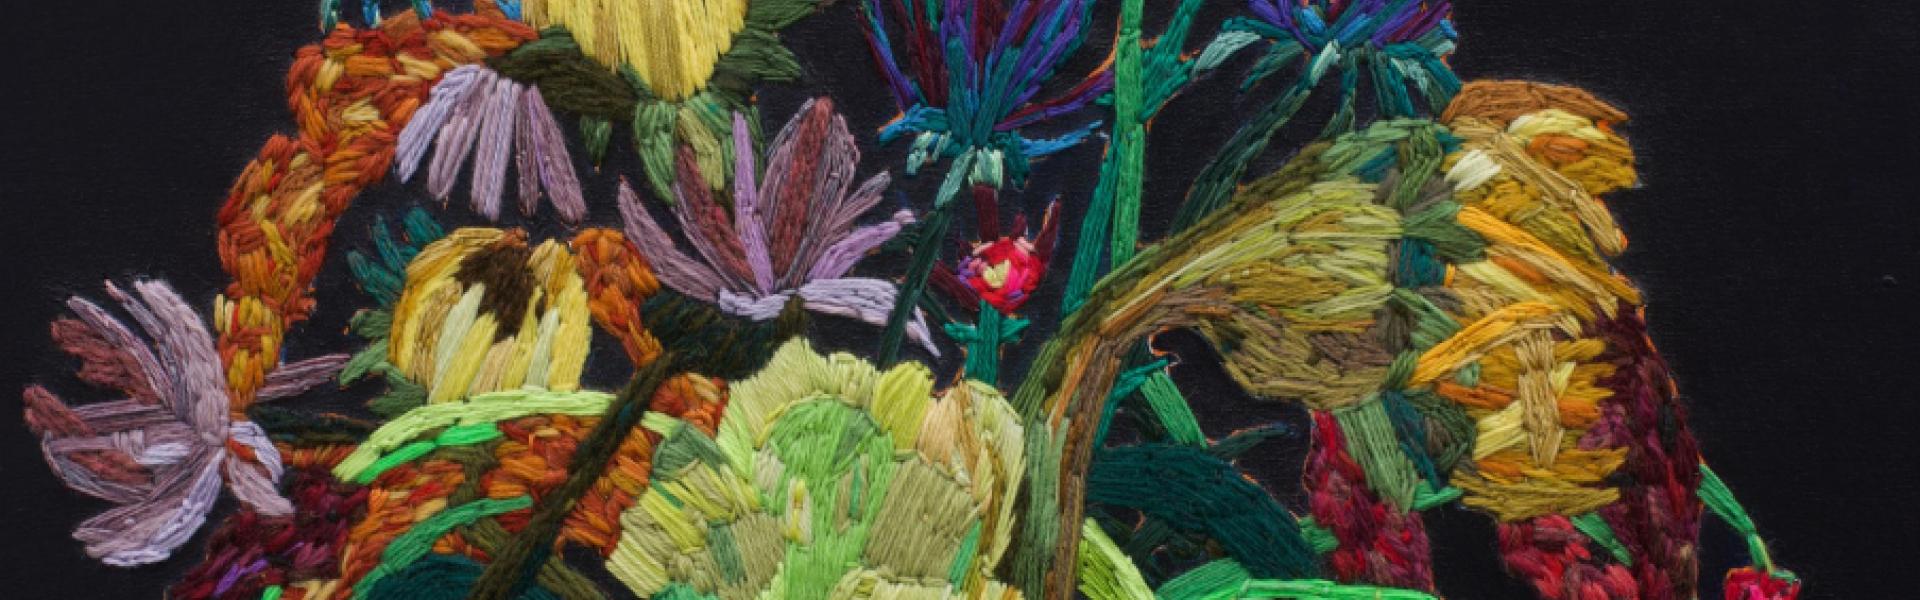 banner_Michelle-Marin-Wildflowers-At-Dawn-2020-Detail-2-j.20210520101022.jpeg